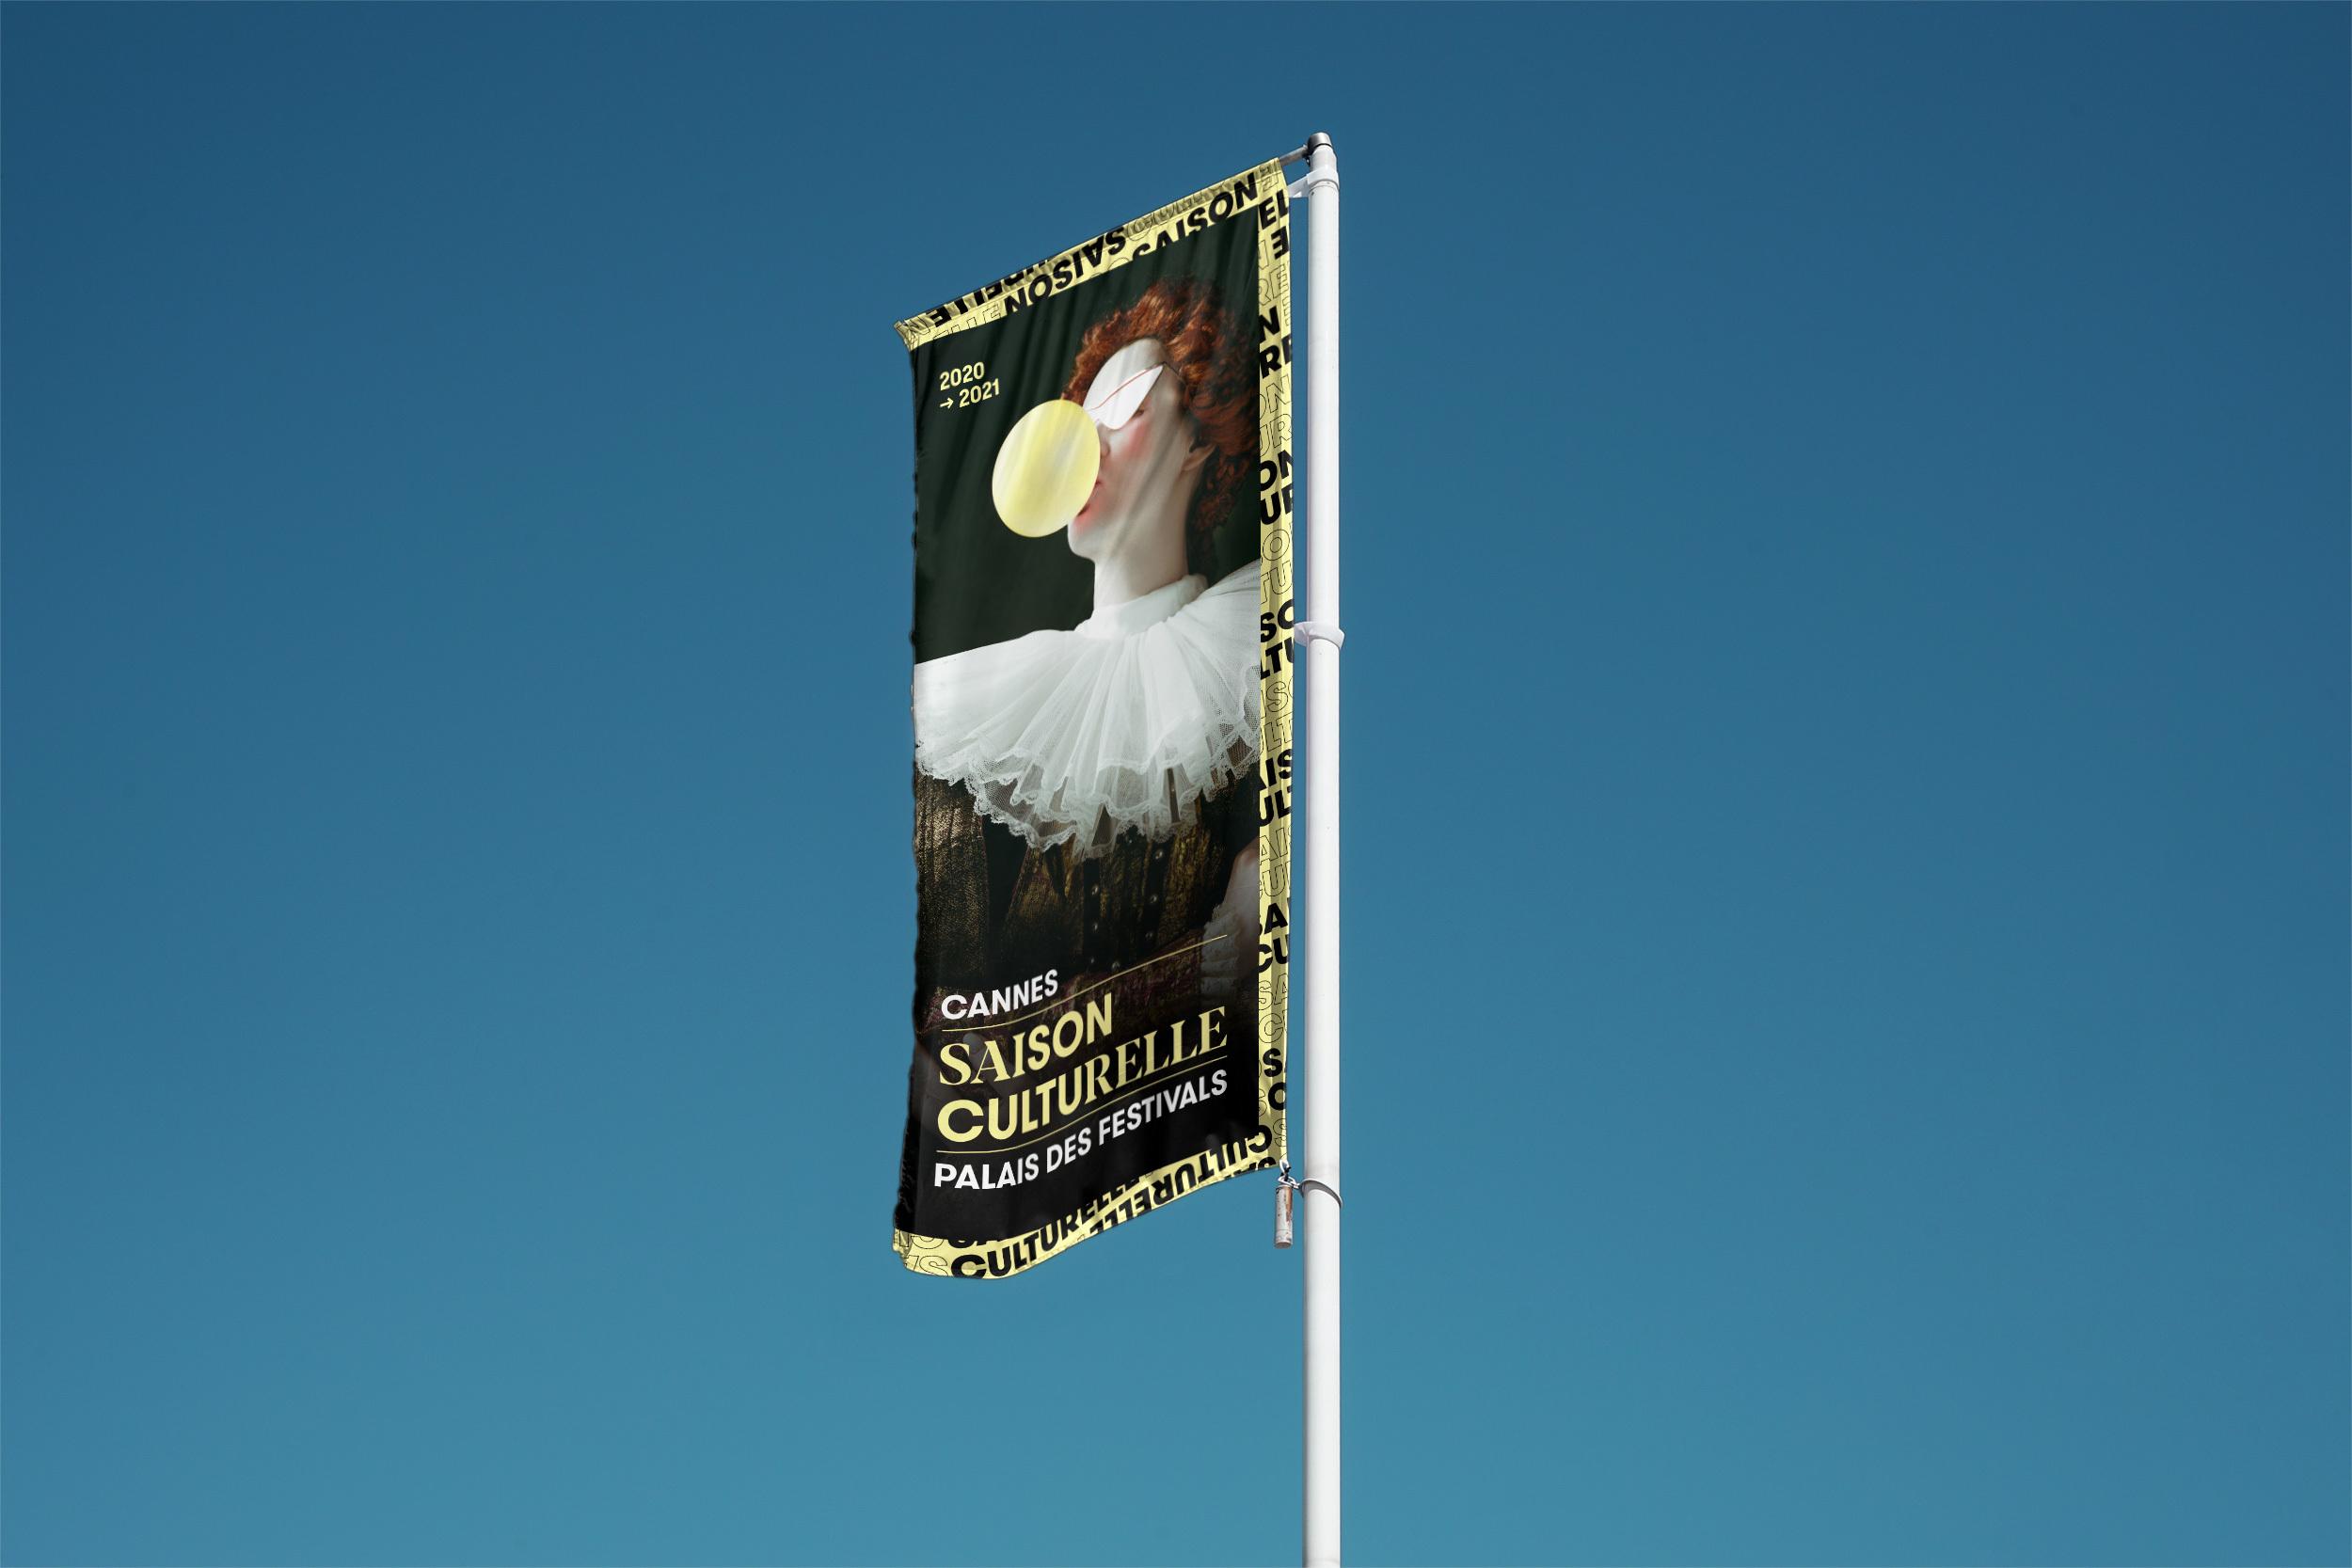 Palais Da Saison Culturelle Flag 1